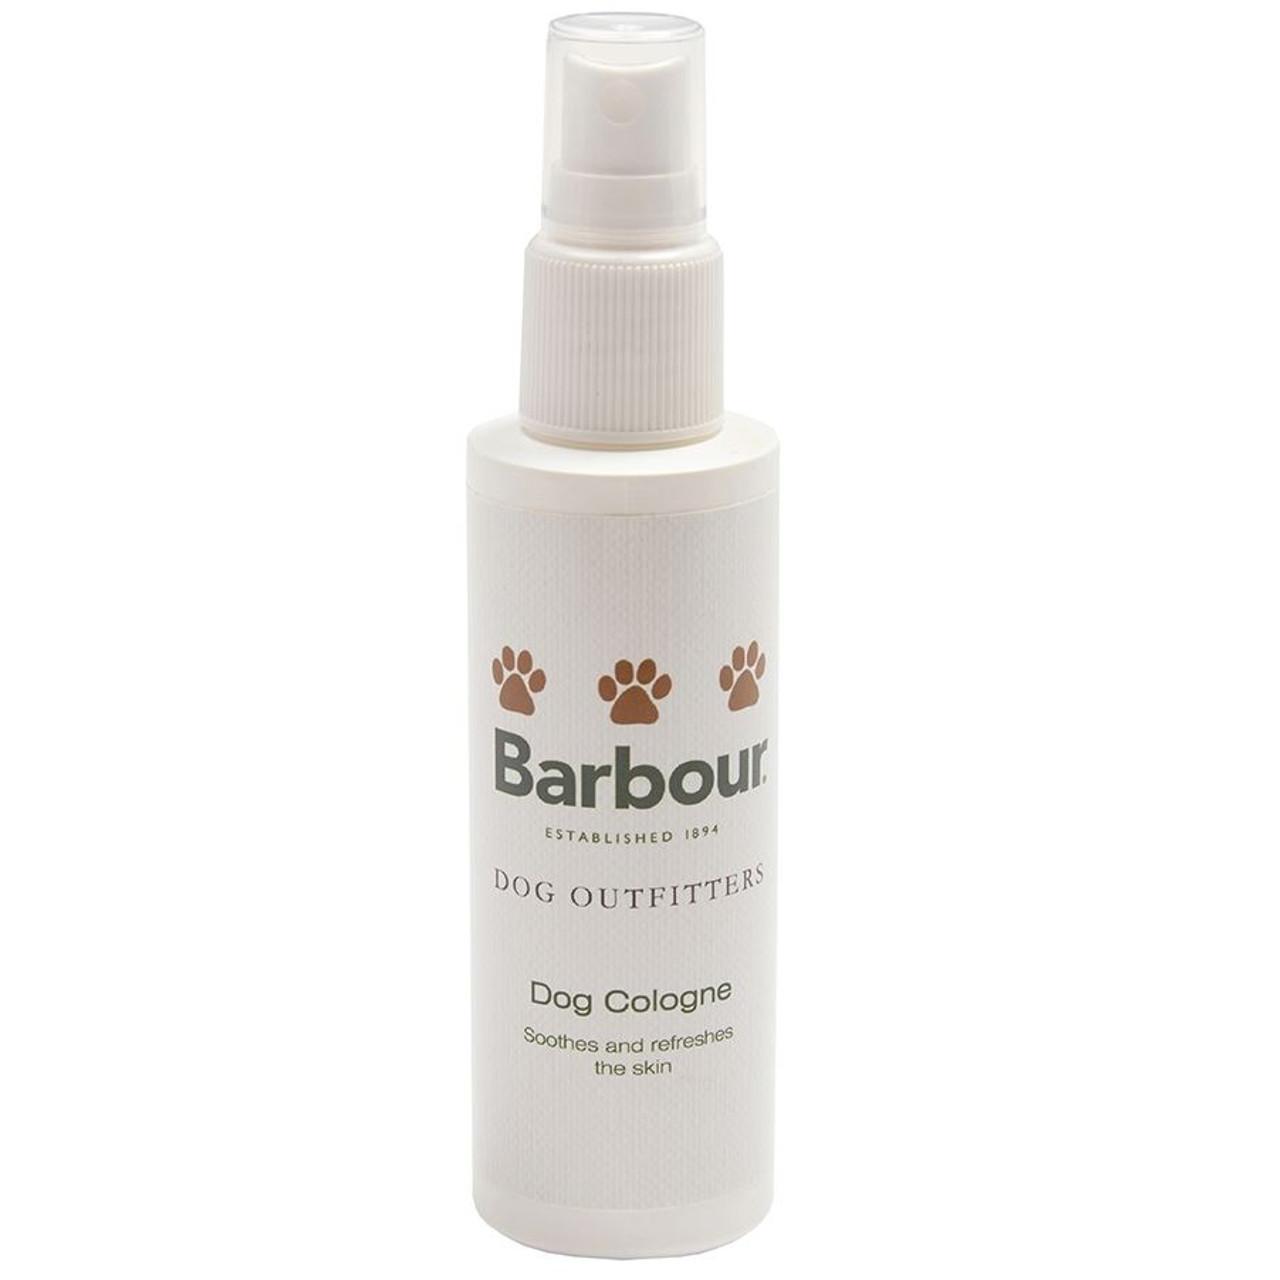 Barbour Dog Cologne